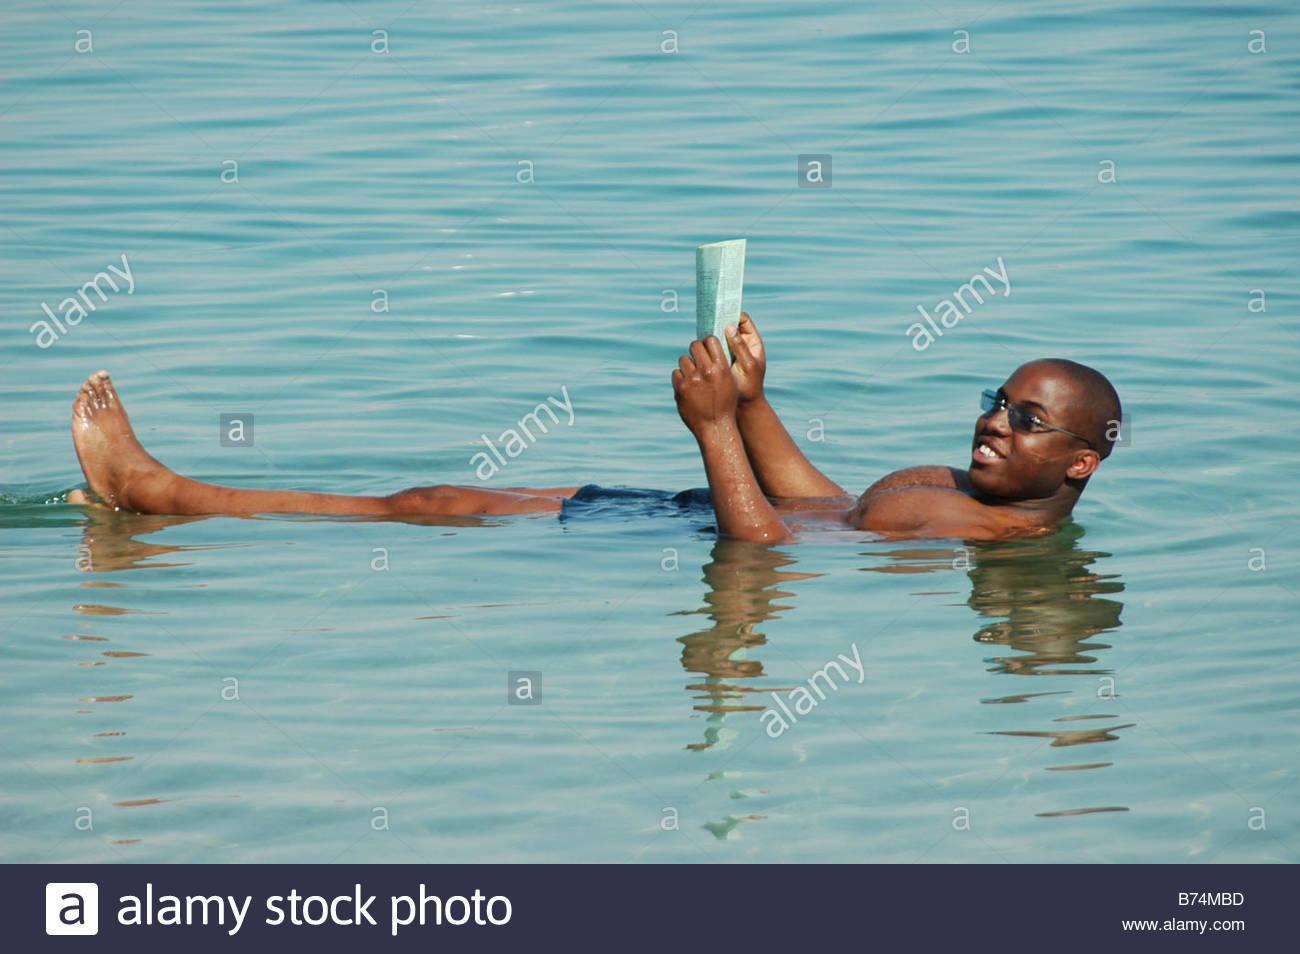 israel-dead-sea-tourist-reeding-newspaper-while-floating-in-the-water-B74MBD.jpg